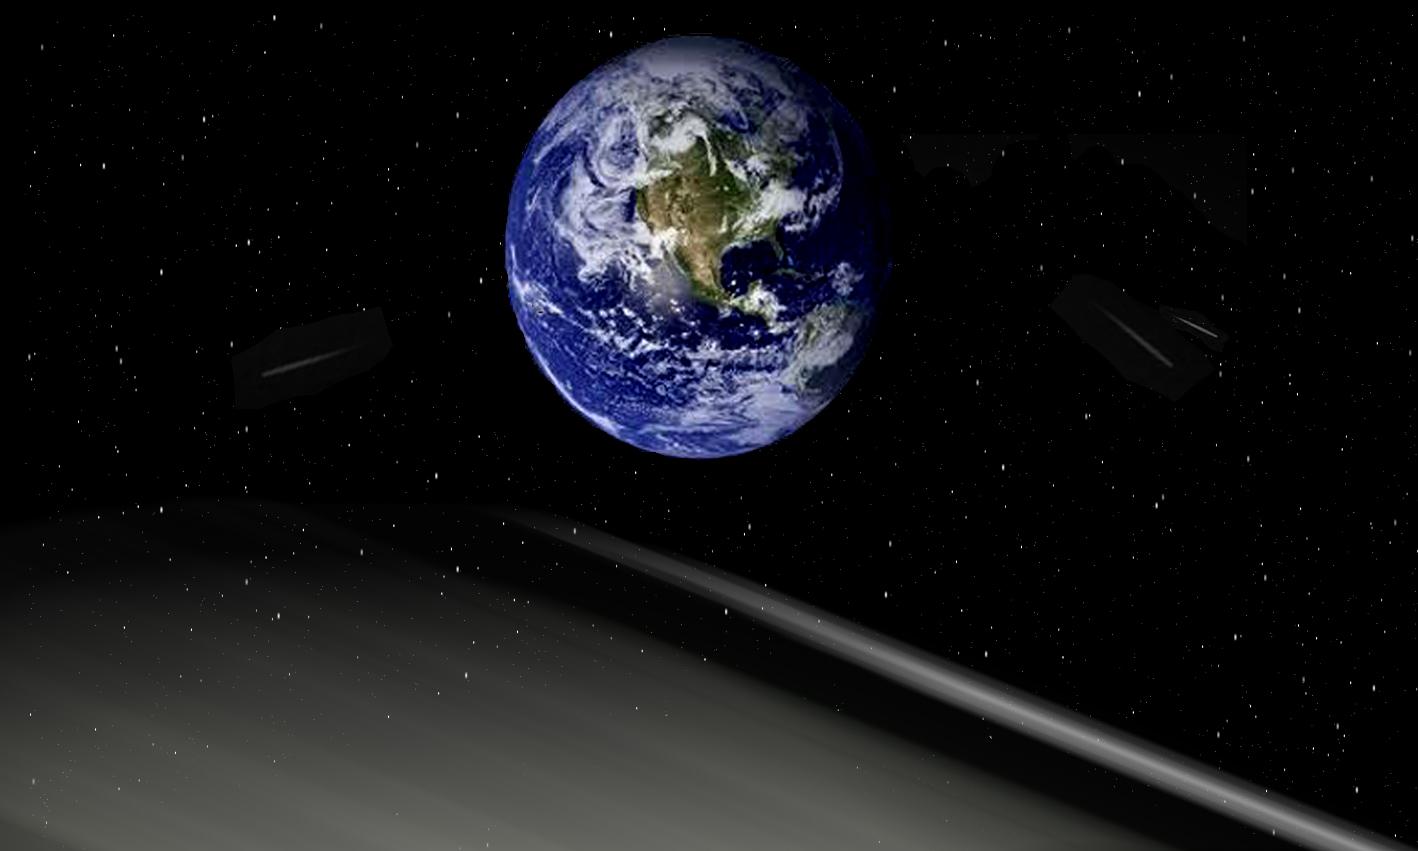 Der Planet Erde